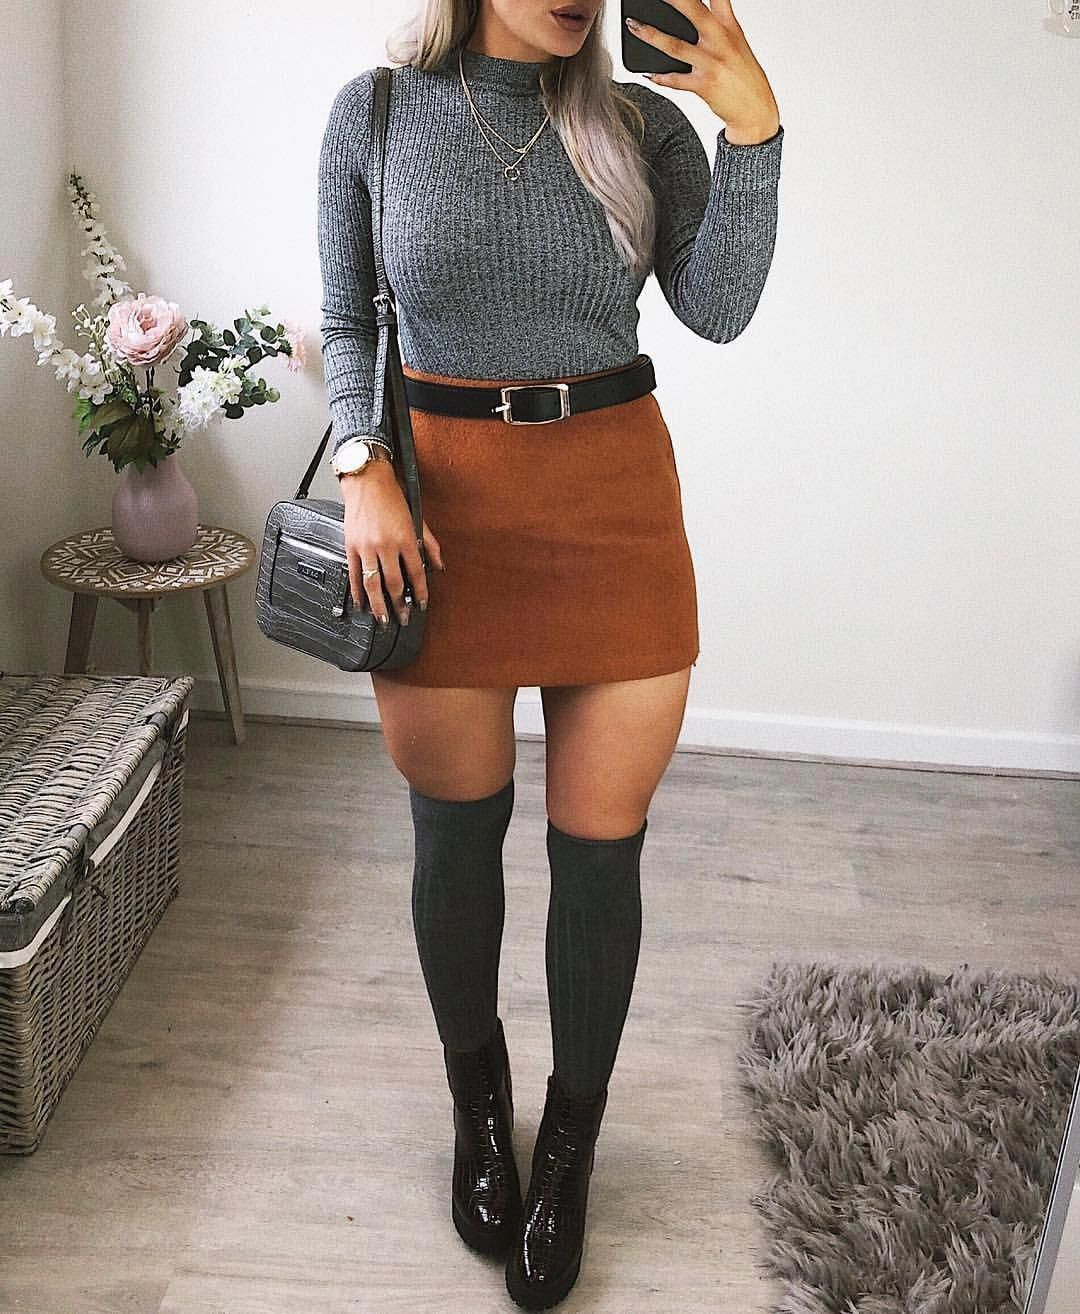 11+ Fashion Inspo Outfits